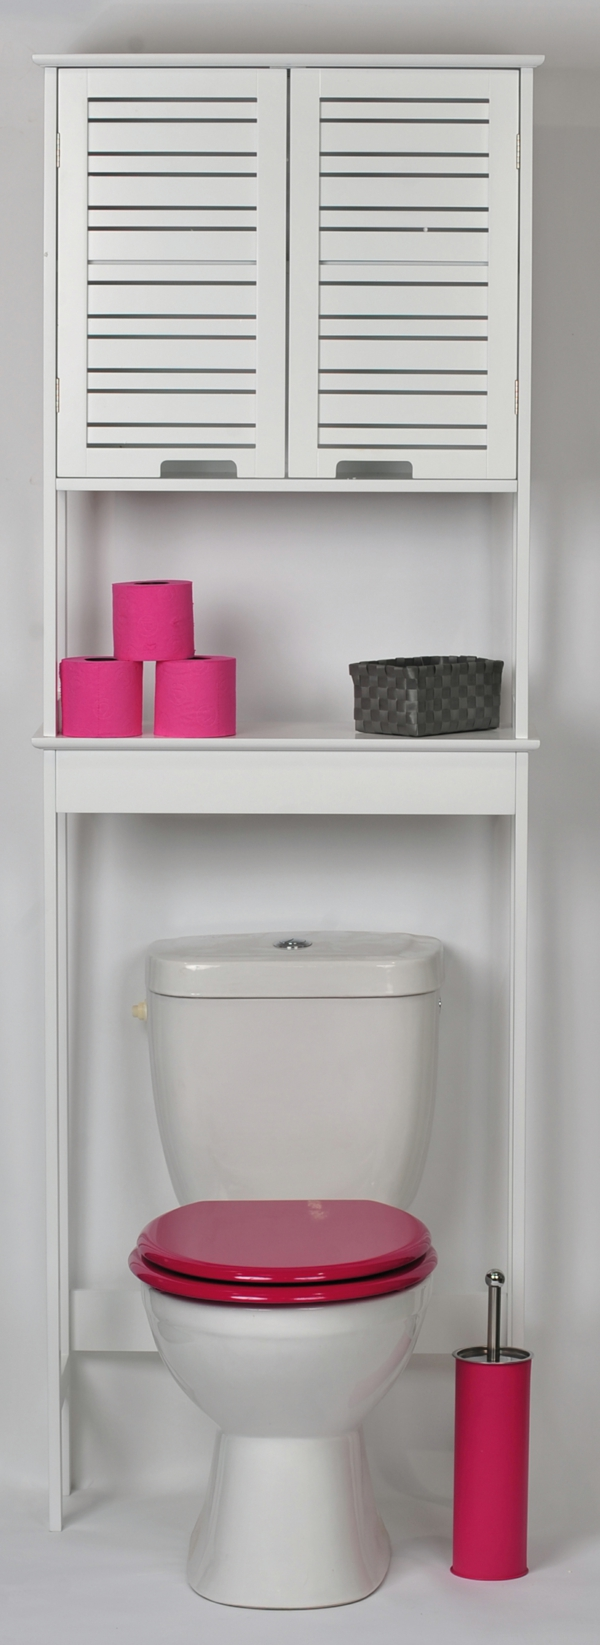 Le meuble wc  Archzinefr